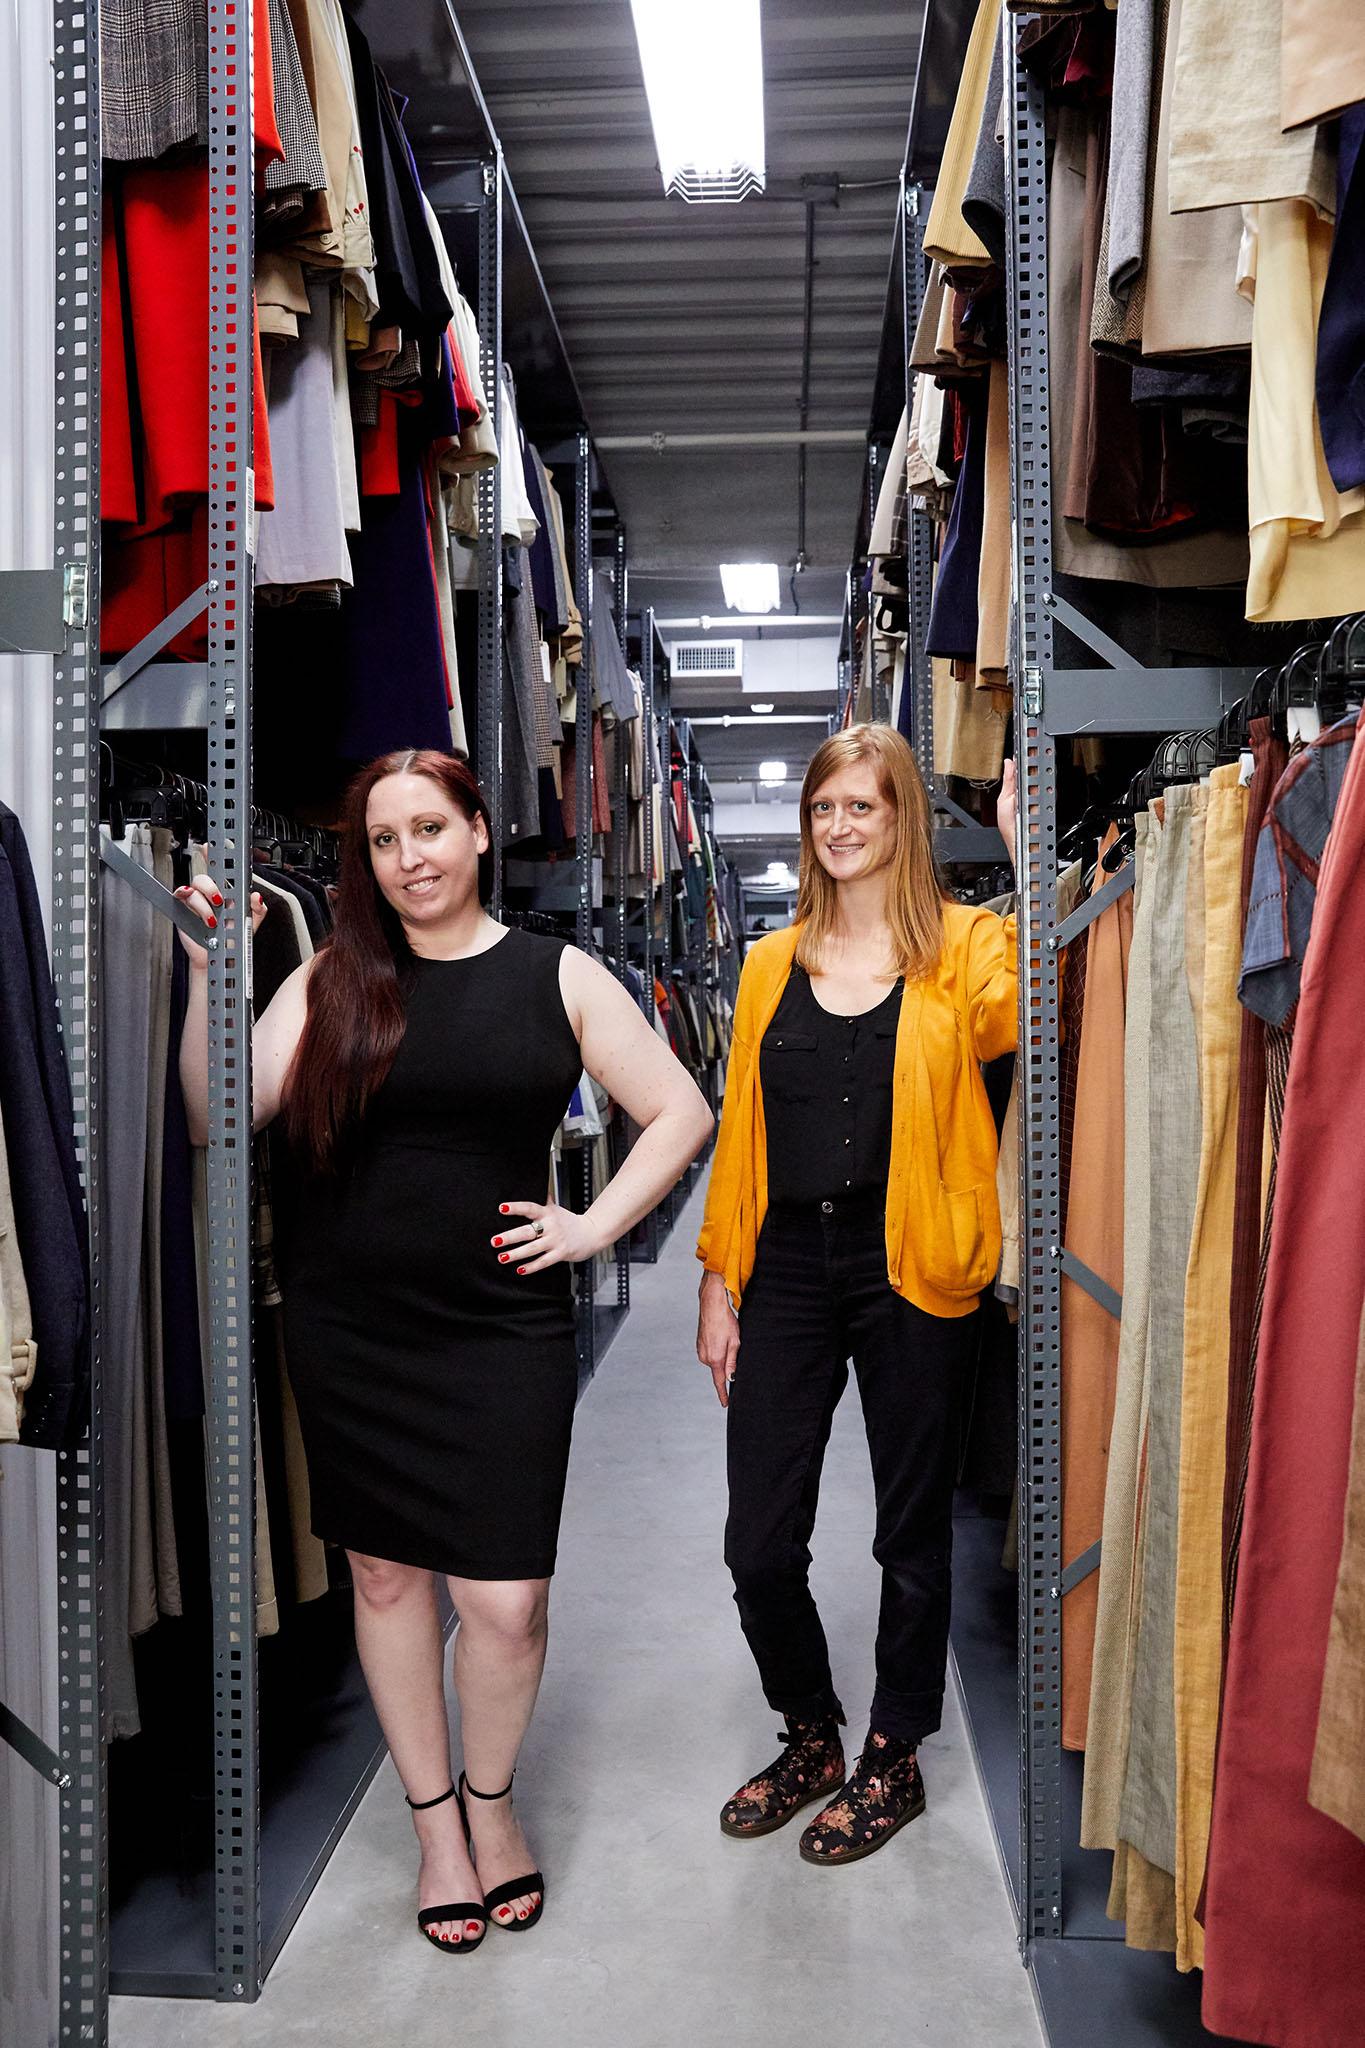 Calvin Klein archivists Vanessa Garber and Jessica Barber.